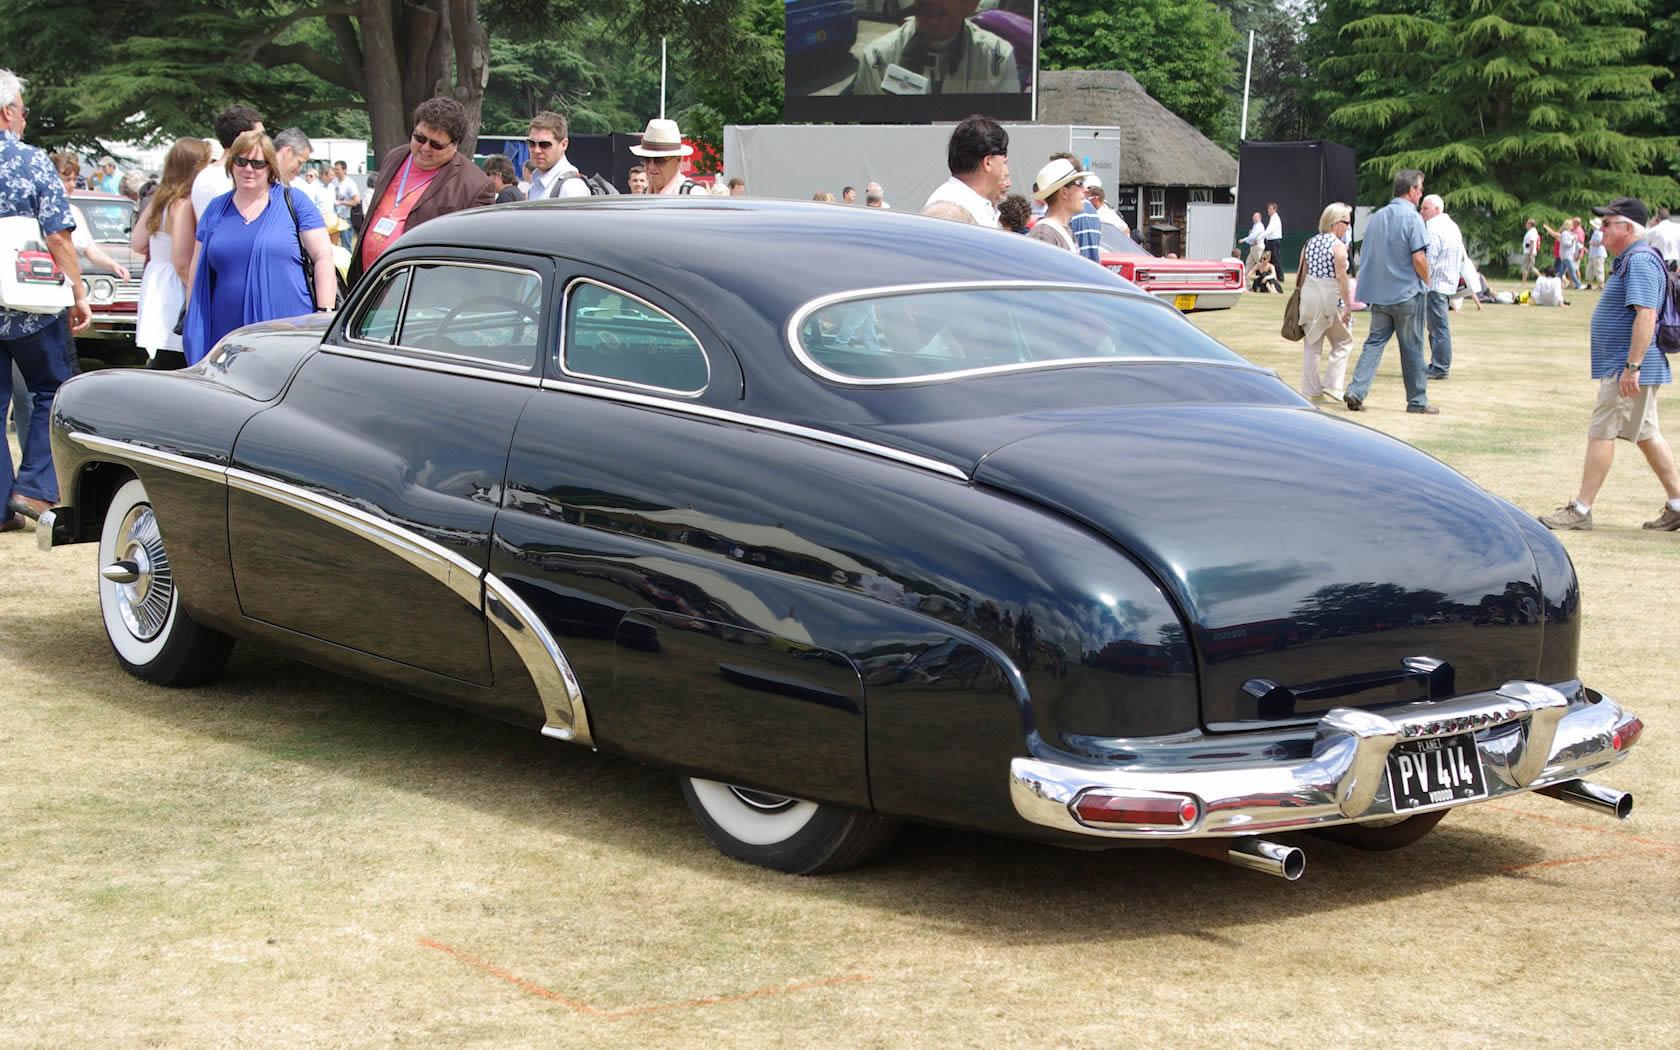 Cobra Merkury 1950 In Movie With Sly Stallone Top Hot Cars 1950s Dodge Mercury